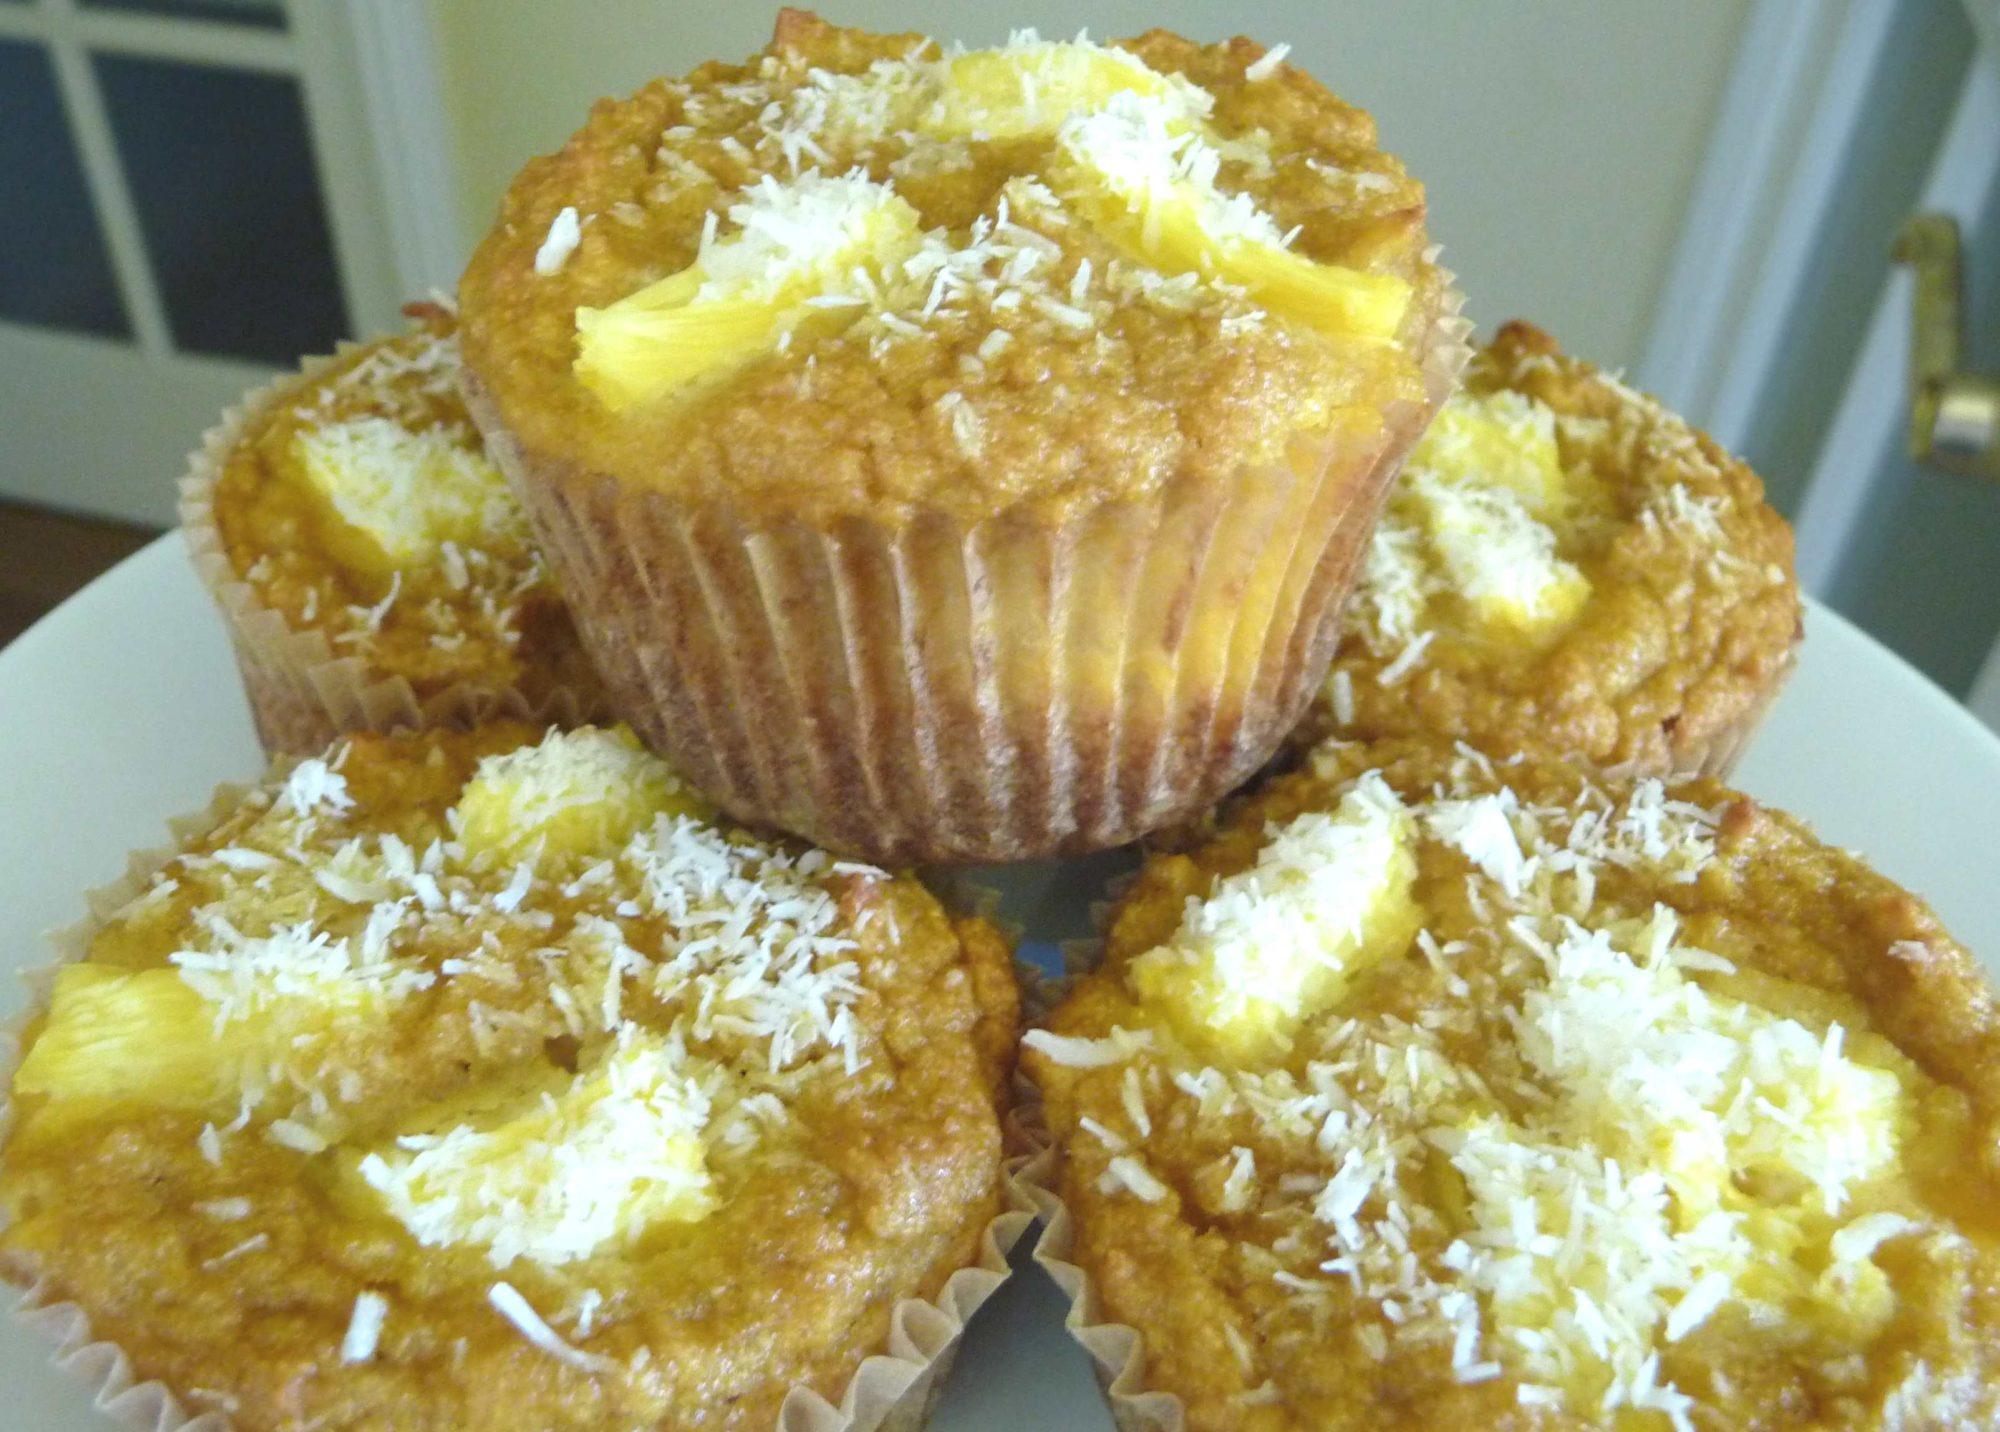 Pineapple-Coconut Muffins (GF)